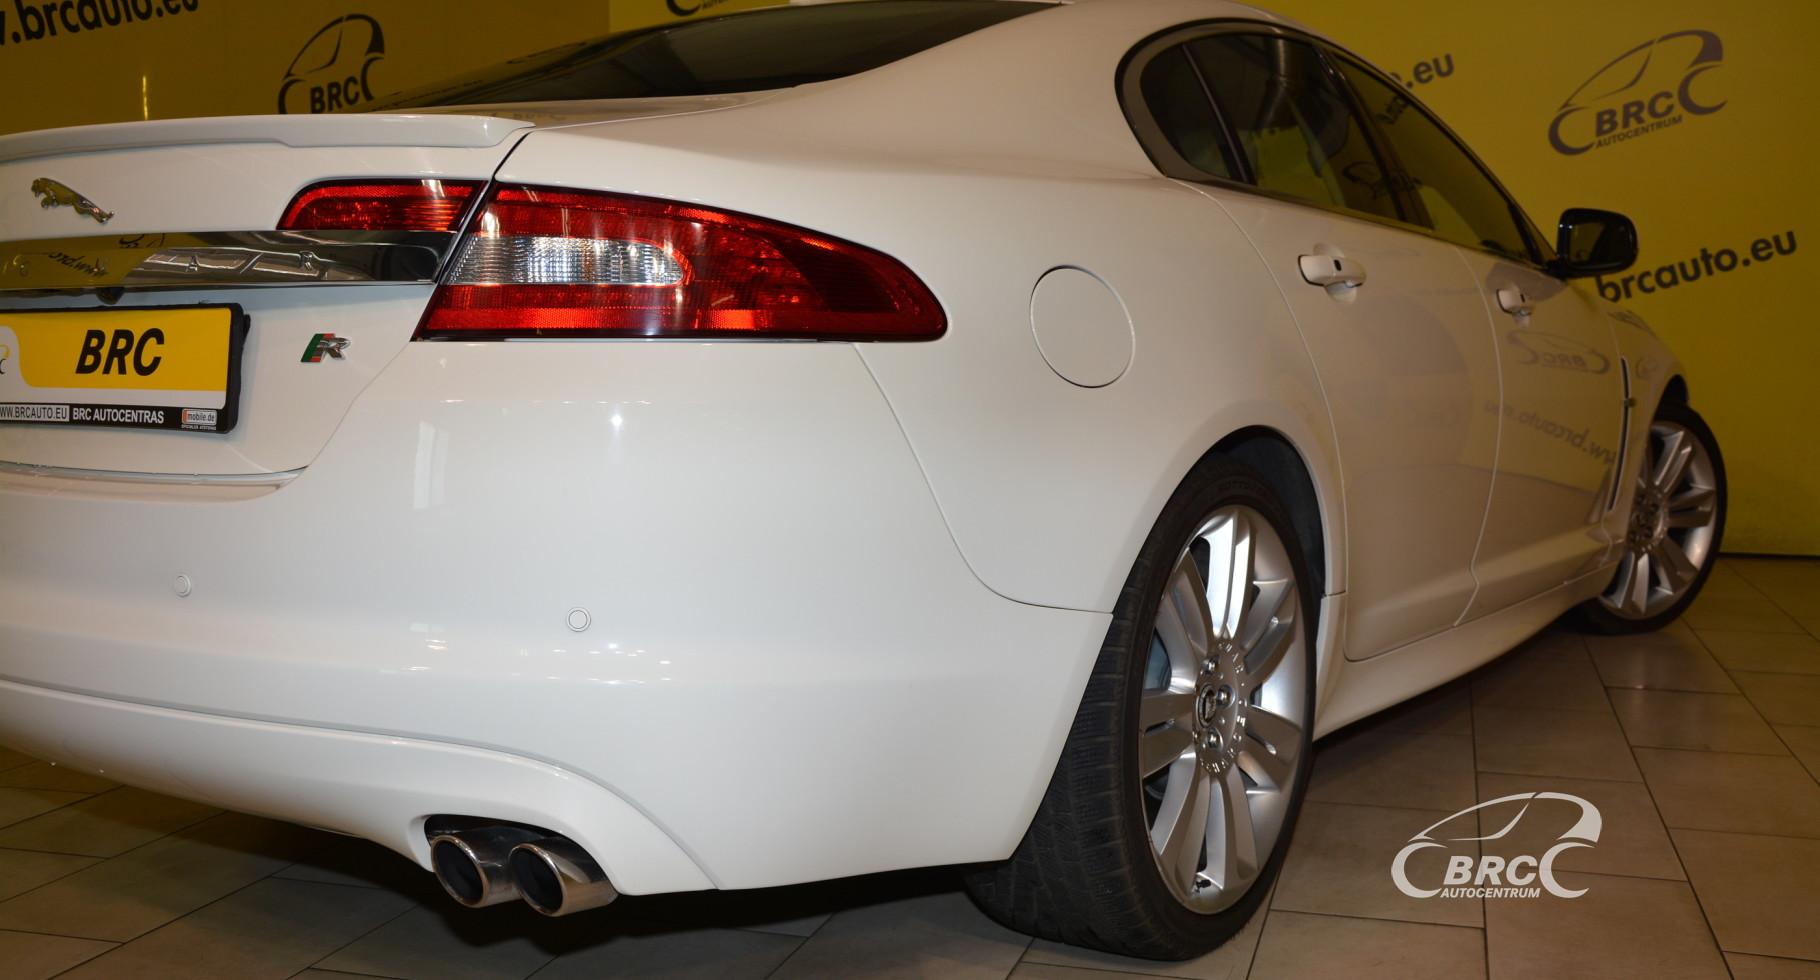 Jaguar XF R 5.0 Supercharged Automatas